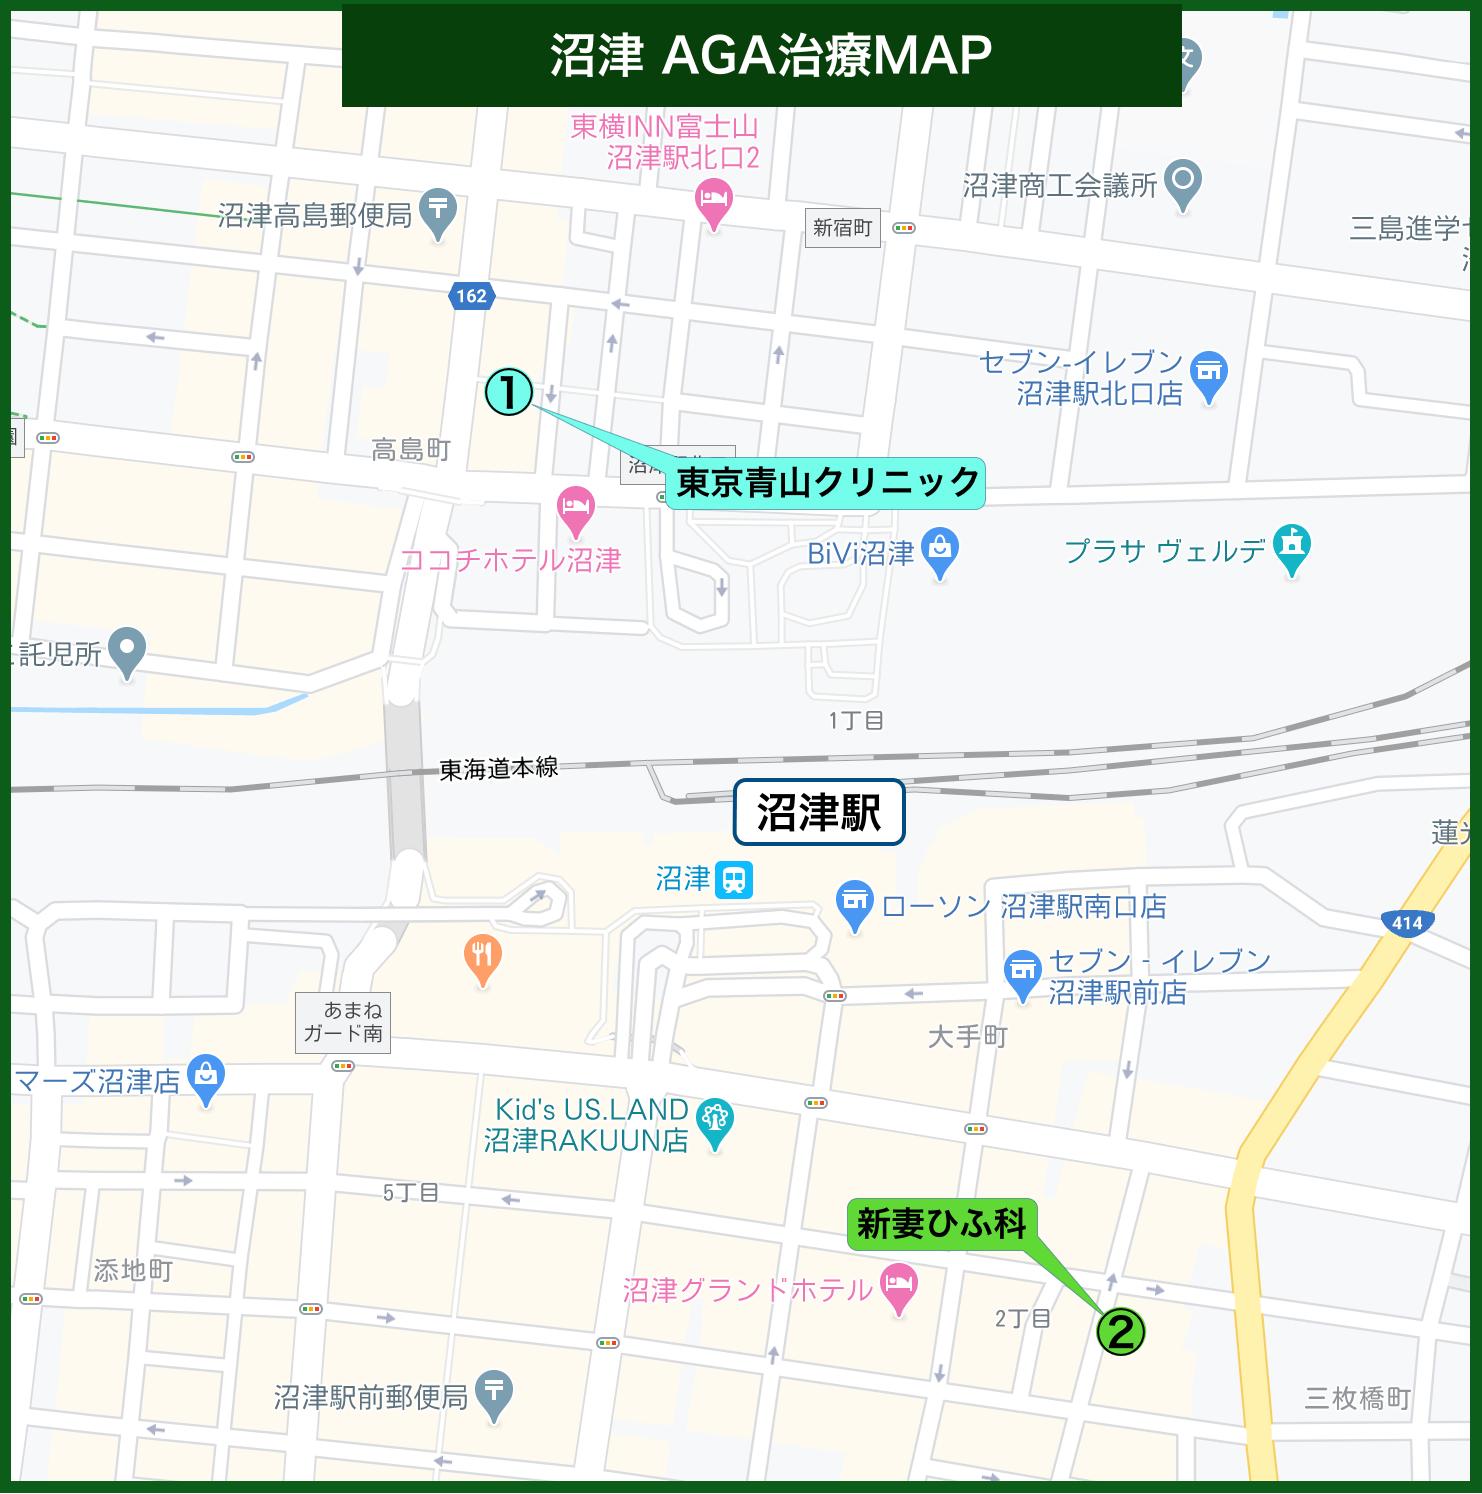 沼津 AGA治療MAP